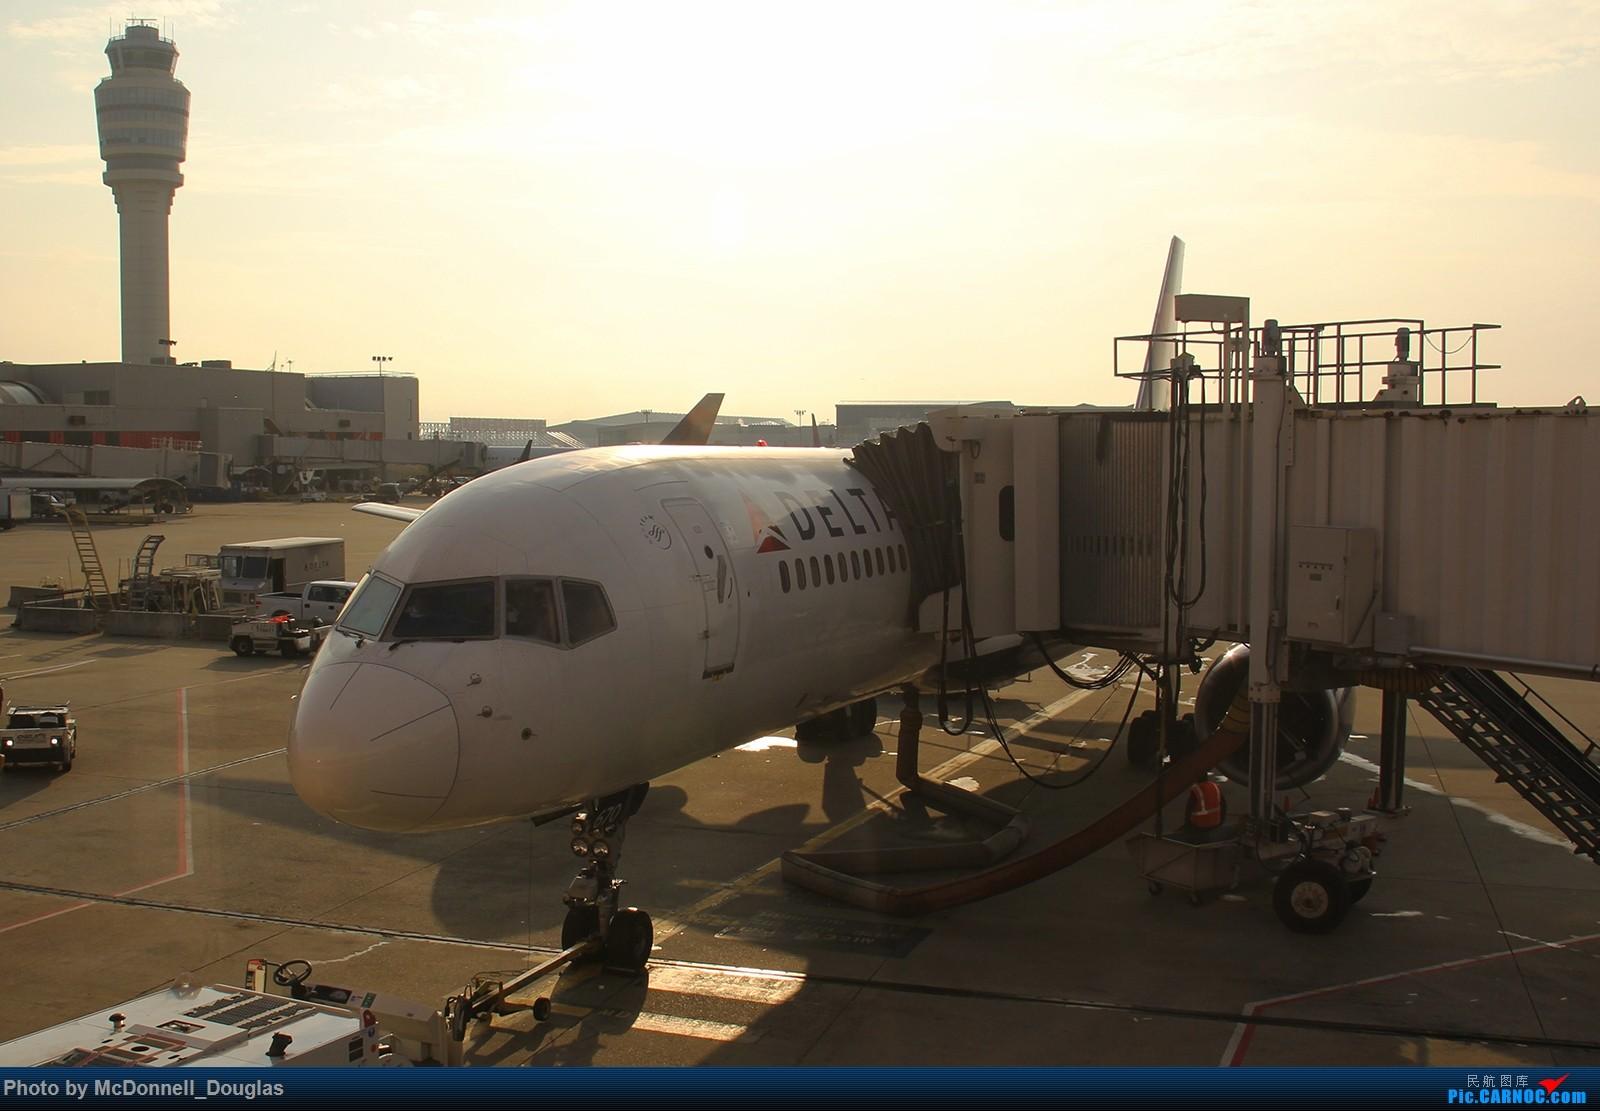 Re:[原创]【上海飞友会】图会很多,也有很多驾驶舱,杂七杂八的美帝,梦寐以求的圣马丁,这更绝不弃贴【驾驶舱已出现】 BOEING757-232 N670DN 美国亚特兰大哈兹菲尔德-杰克逊国际机场